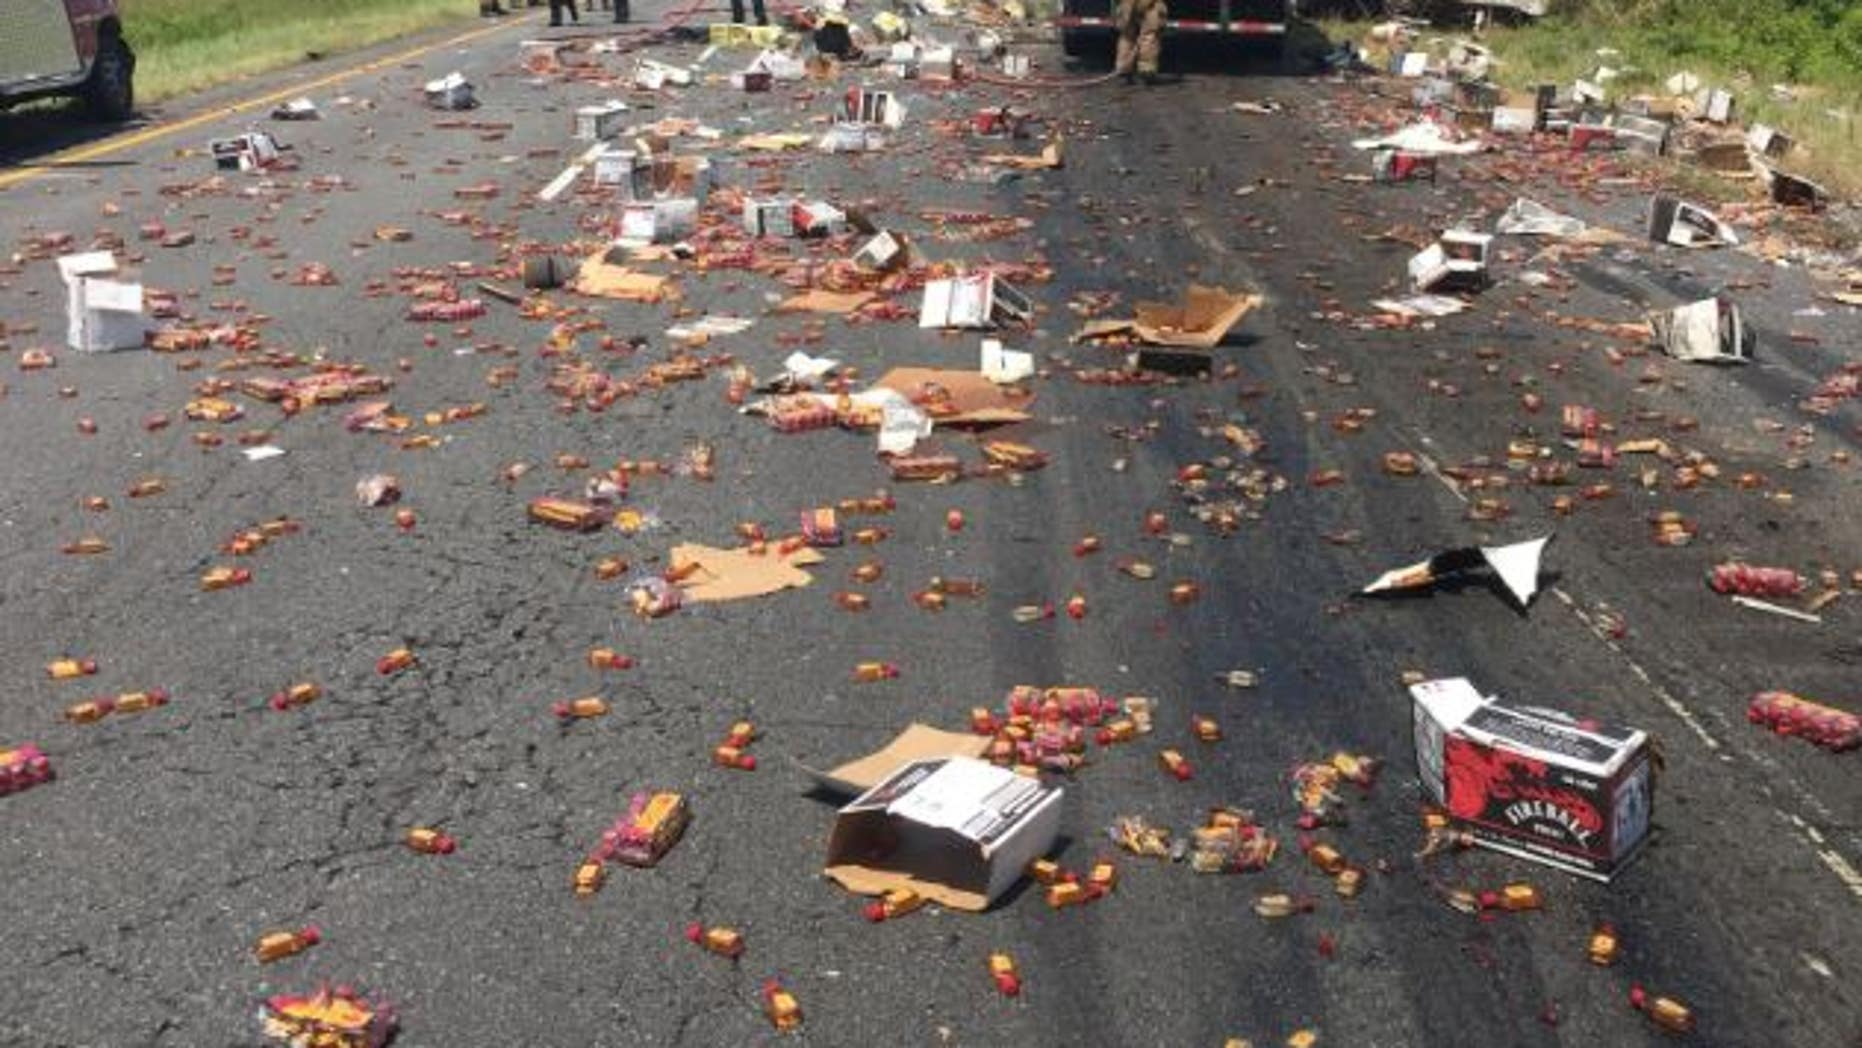 Fireball bottles were splayed across a highway in Arkansas this week as part of a semi-truck crash, KATV reports.